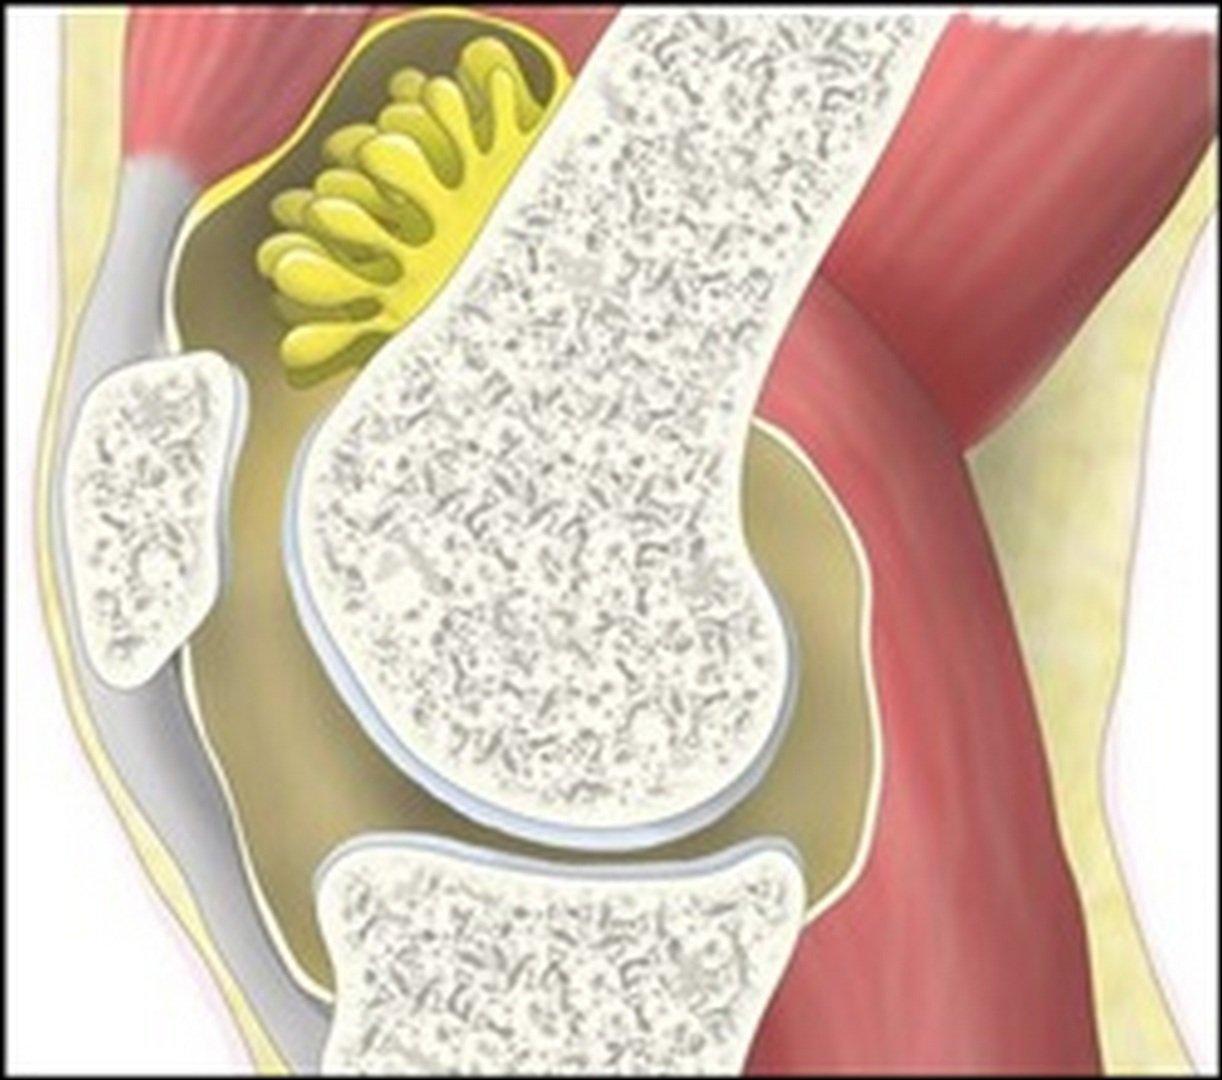 H θεραπεία της λαχνοοζώδους υμενίτιδας στο γόνατο